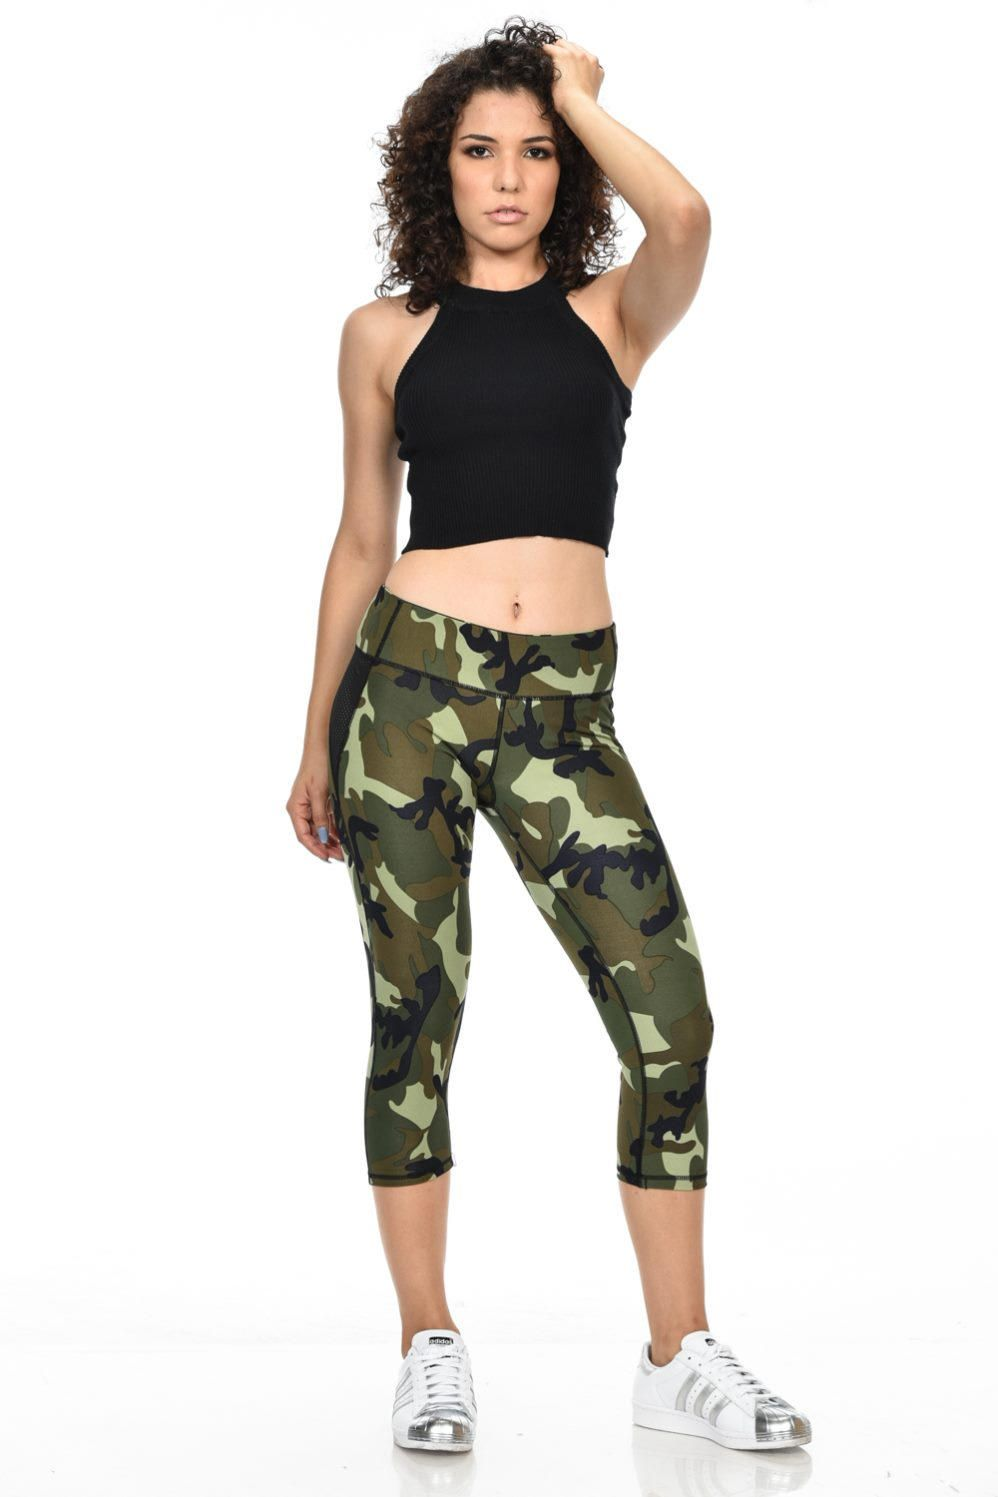 4b4fa09bb1 Free Shipping. Buy Diamante Women's Power Flex Yoga Pants Leggings  Sportswear - Sport Pants - Style C160 at Walmart.com